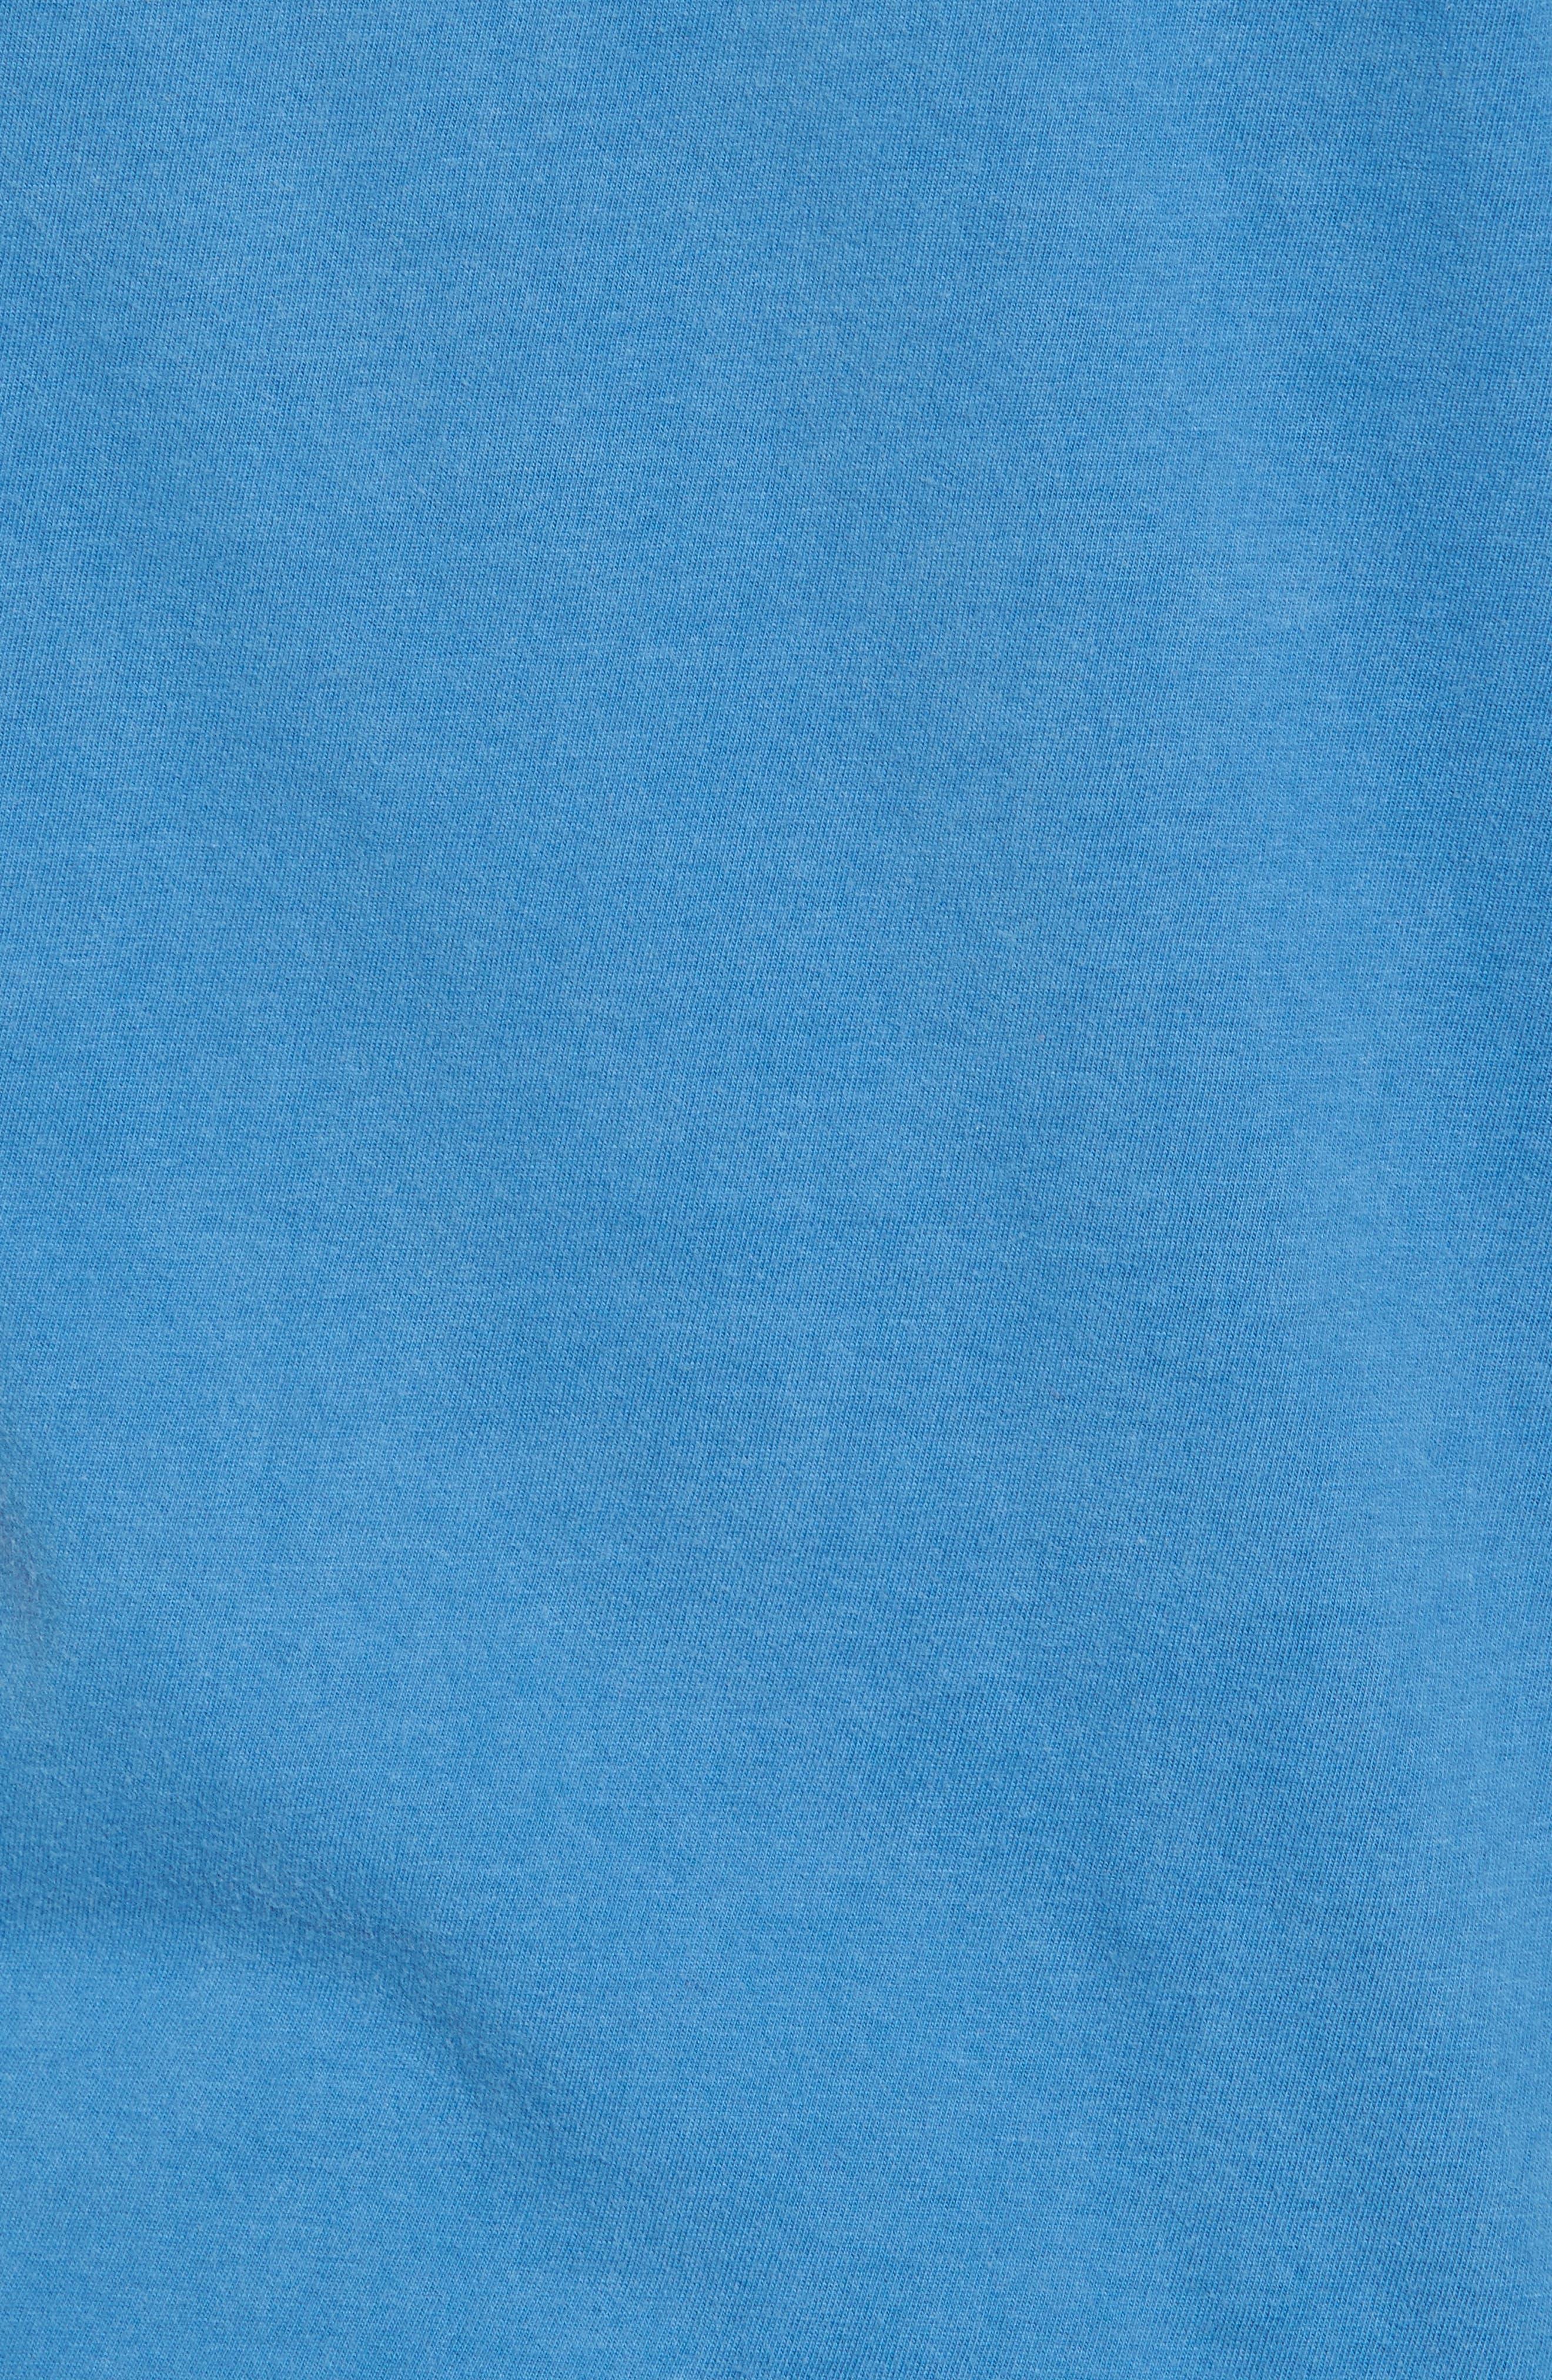 Gresham New York Rangers T-Shirt,                             Alternate thumbnail 5, color,                             Royal